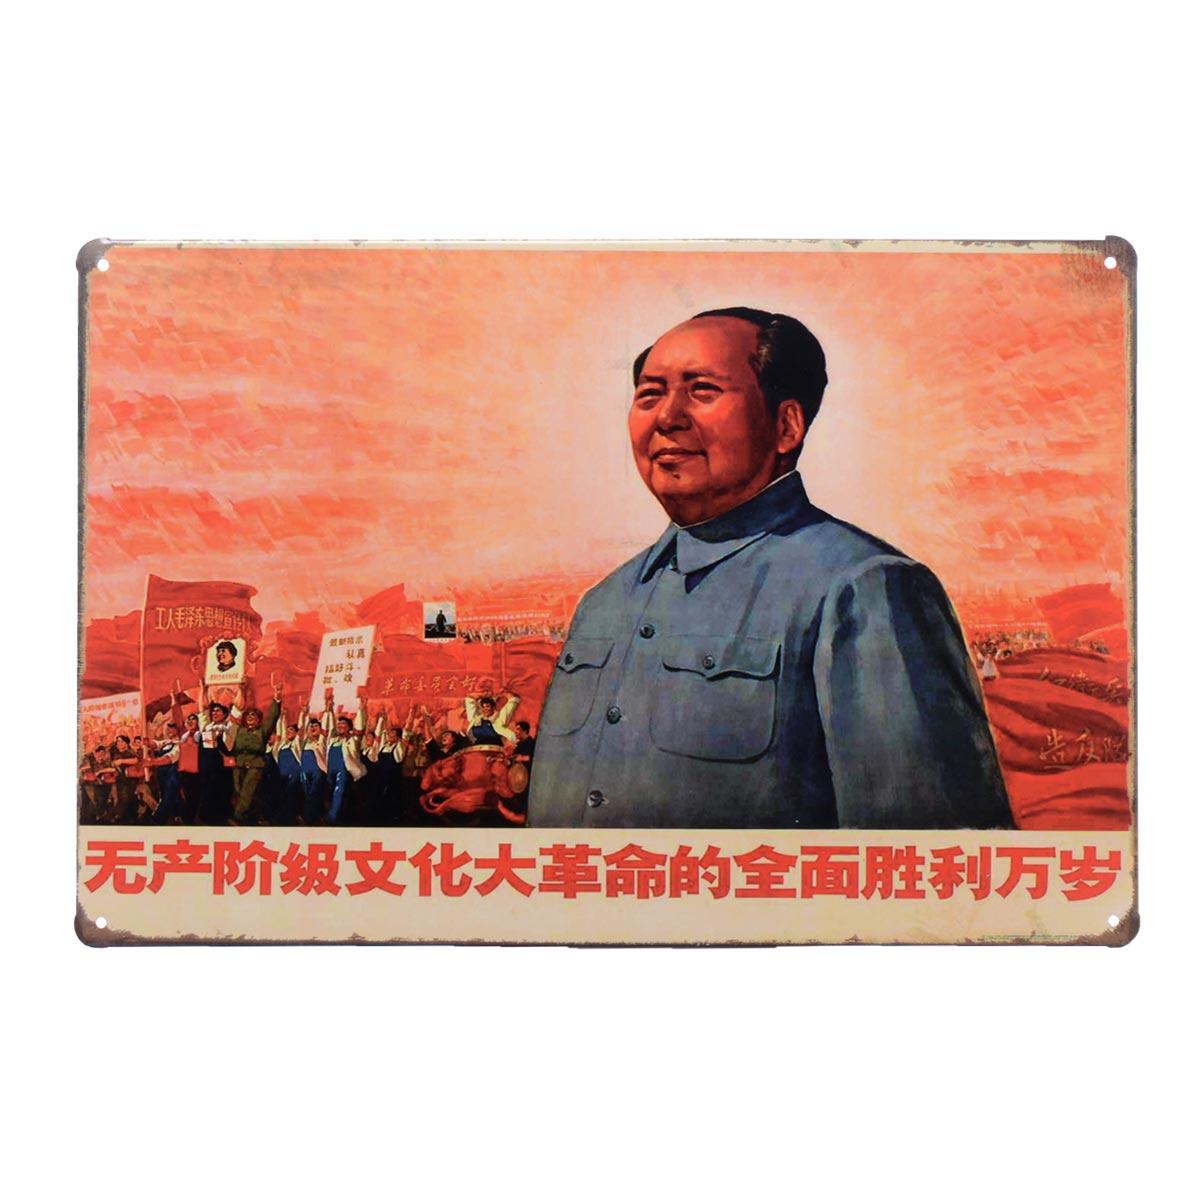 Vintage διακοσμητική πινακίδα τοίχου μεταλλική - 20x30cm - OEM 51854